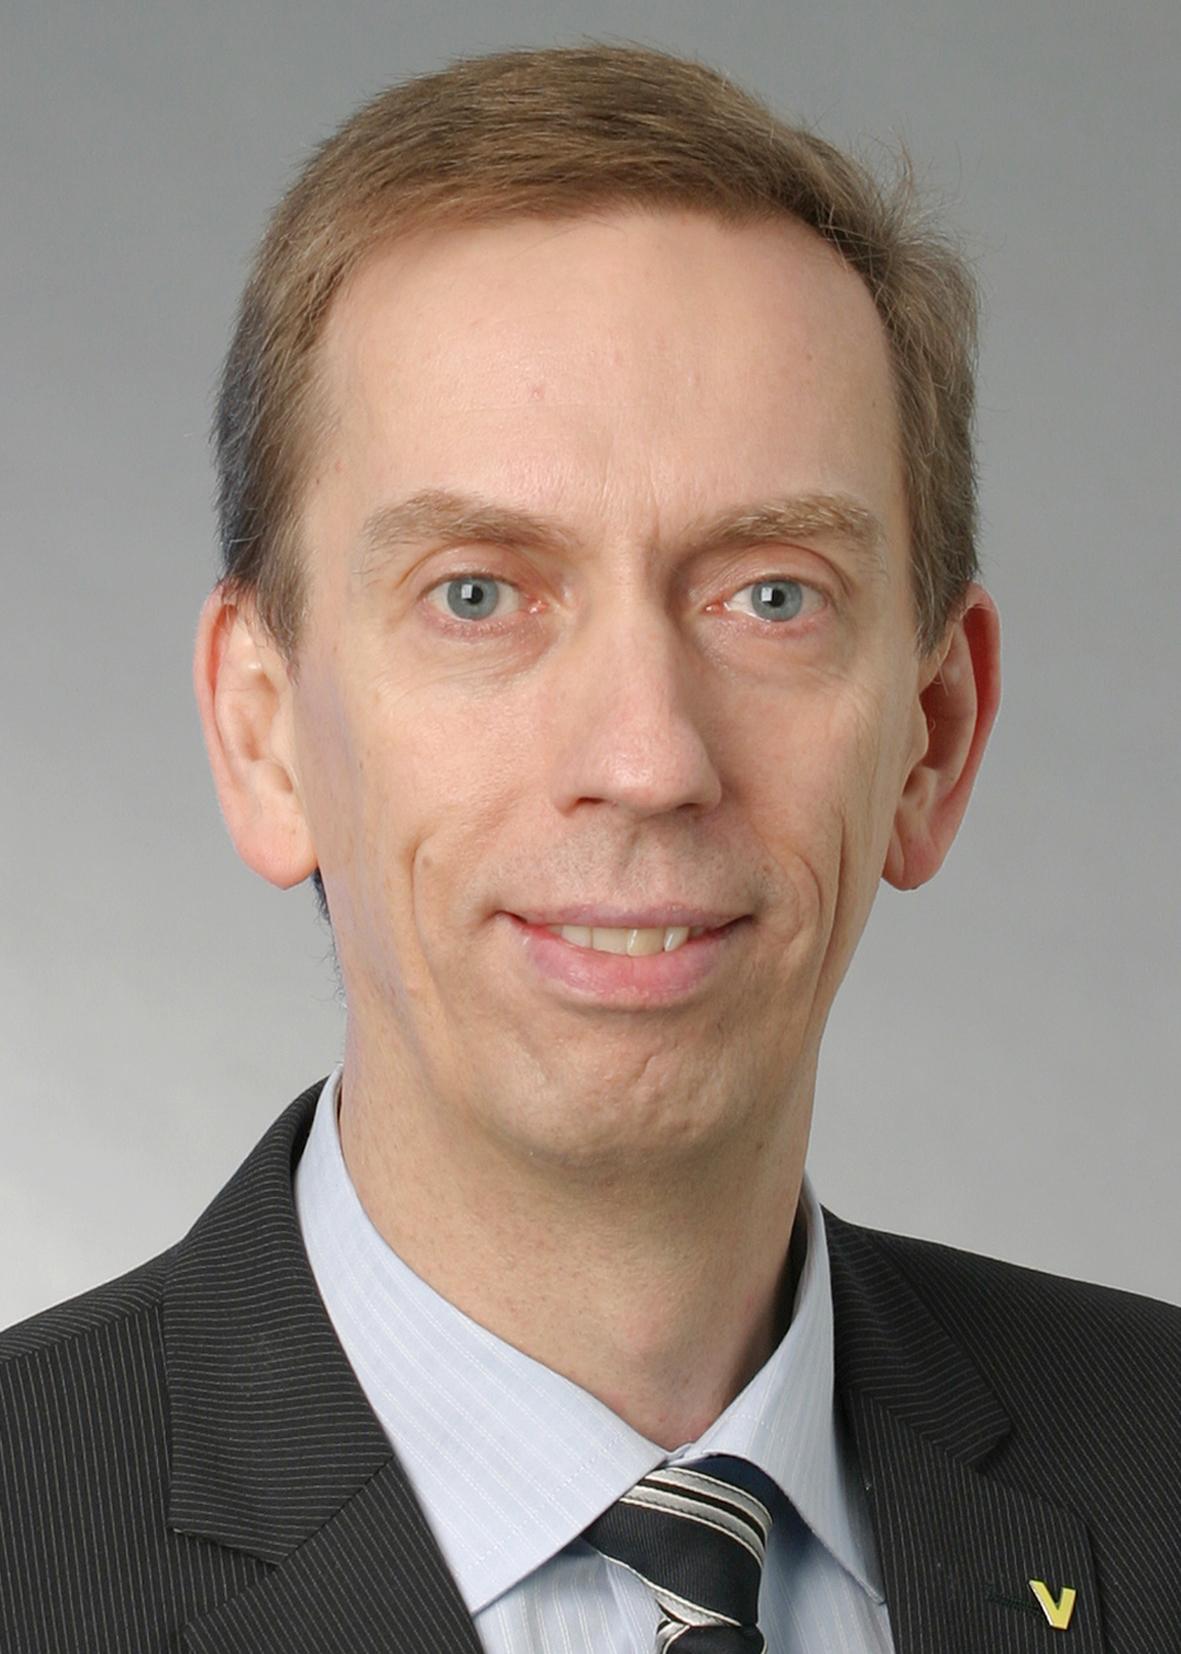 Holger Sack leitet das Produktmanagement bei Vega